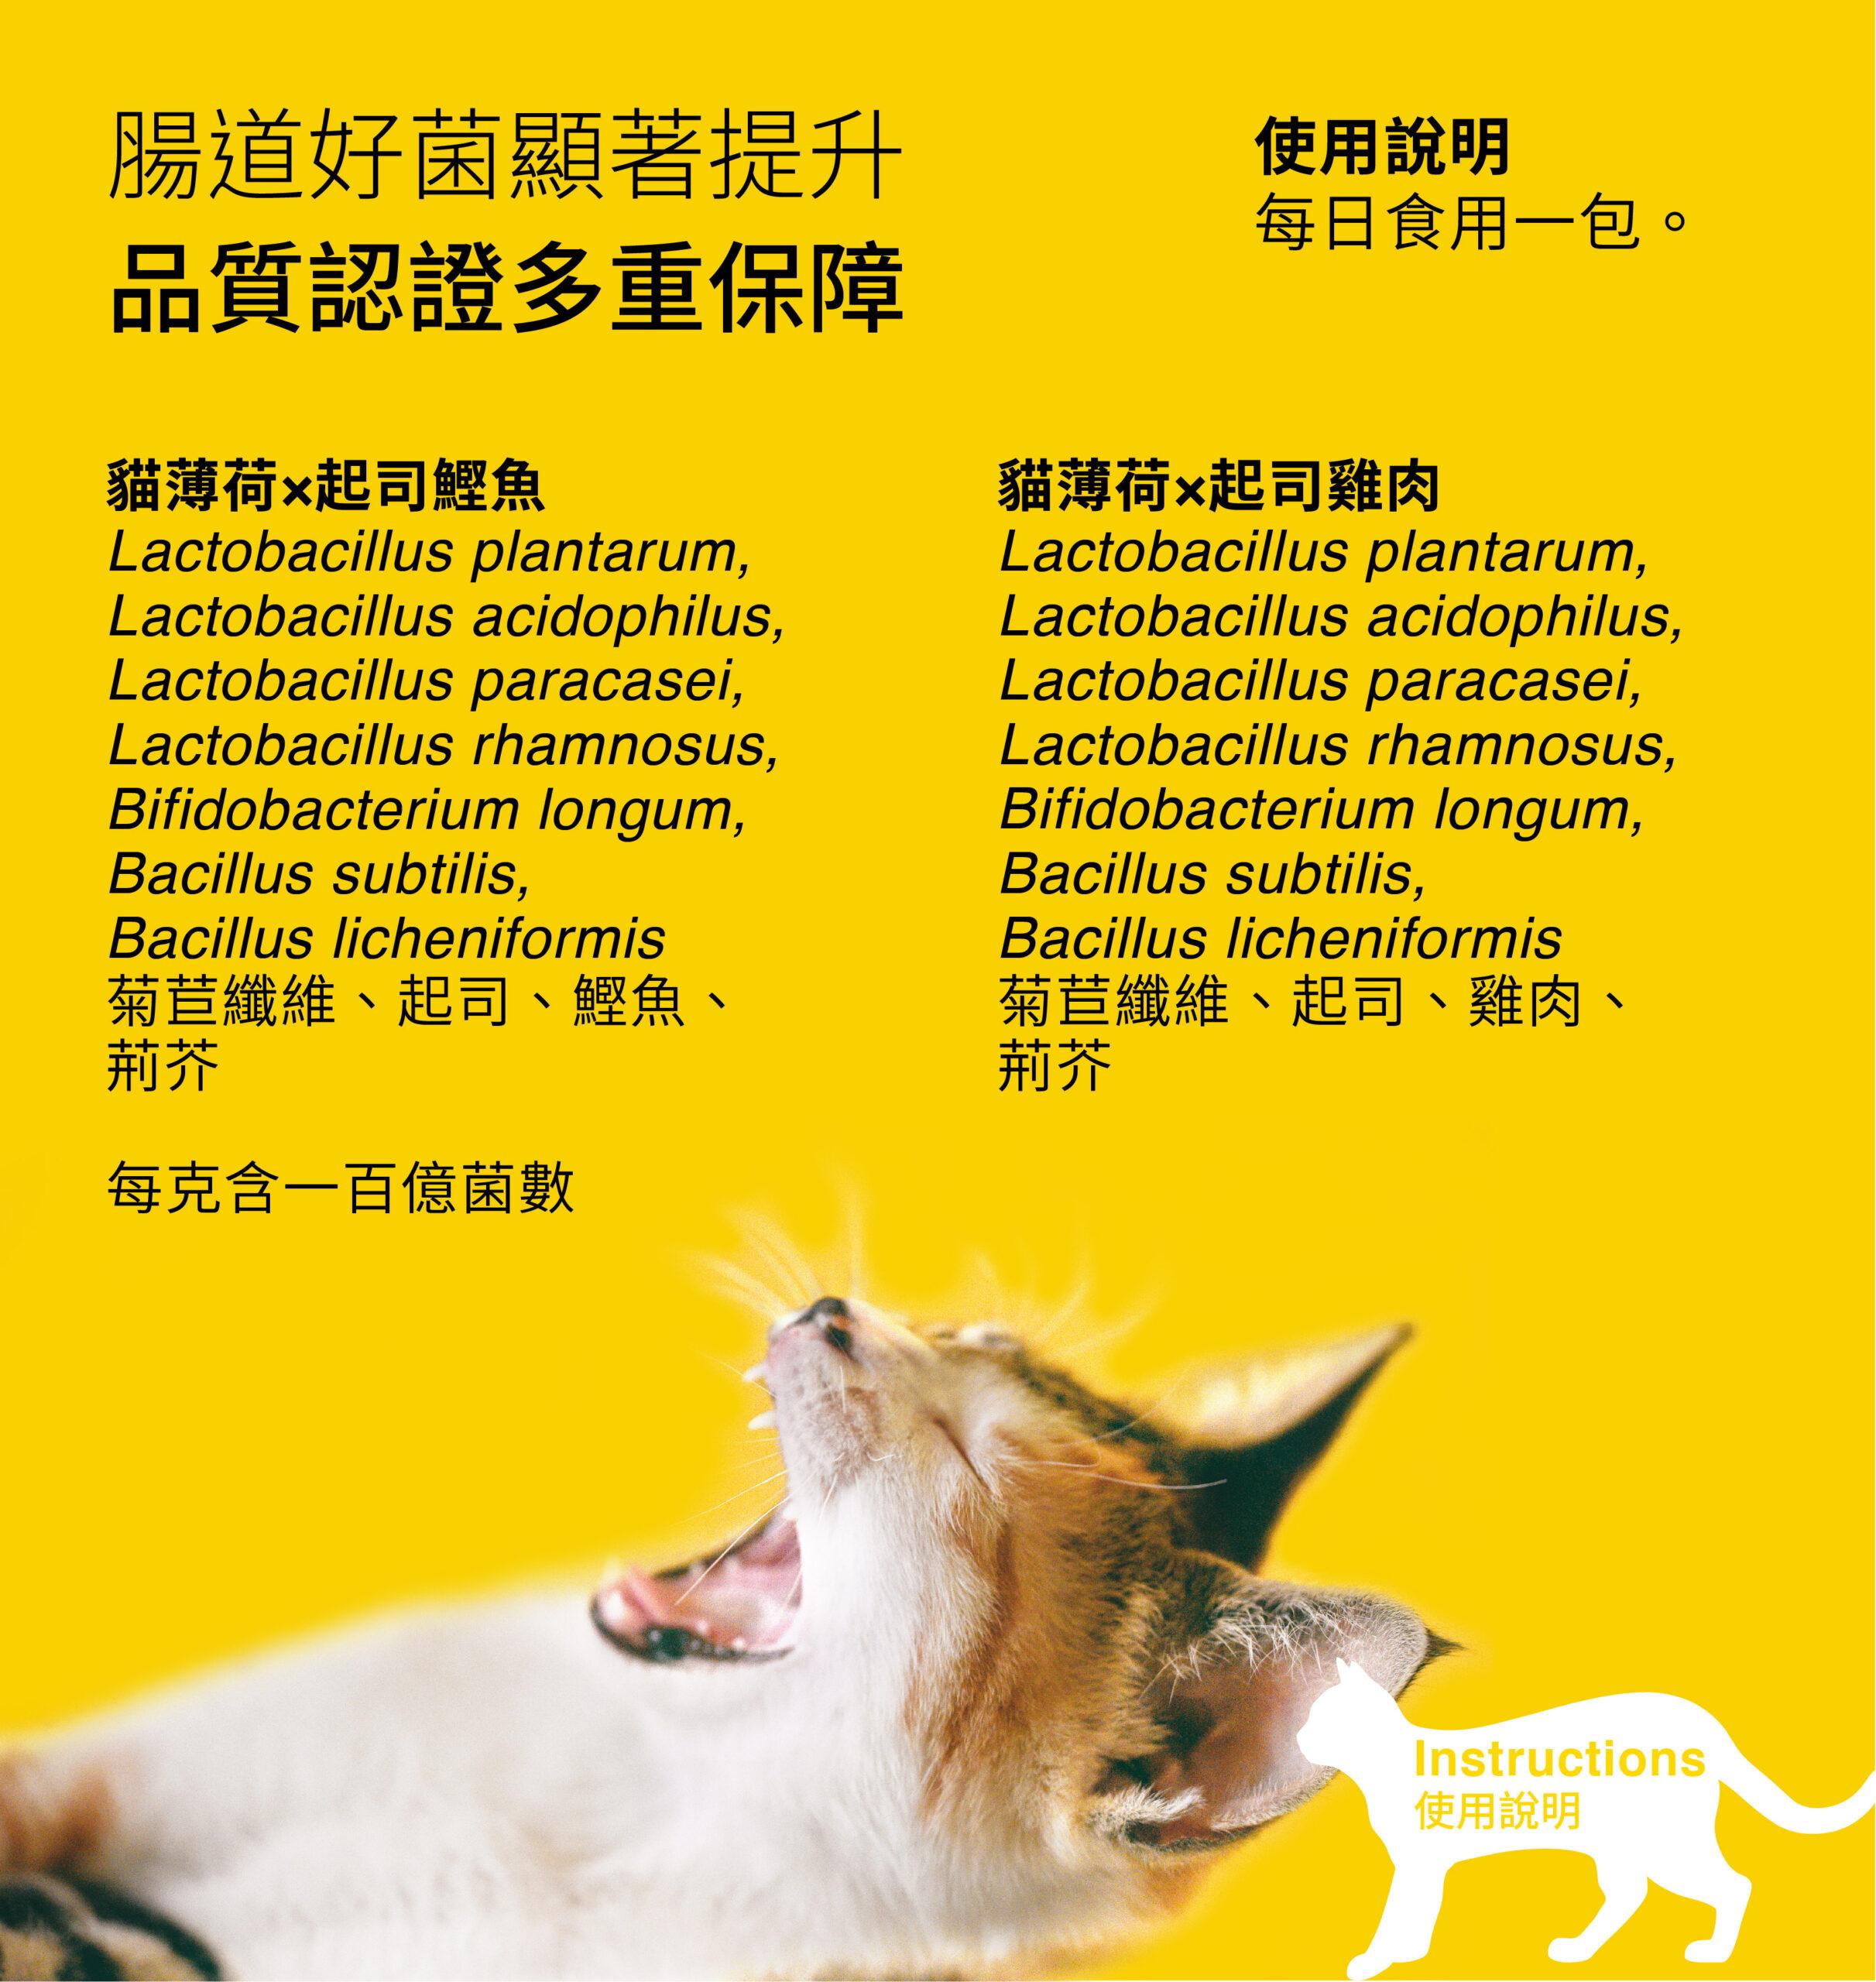 MONSTER BOOST-GUT CARE 貓腸胃保健益生菌、產品成分、起司、使用說明、雞肉